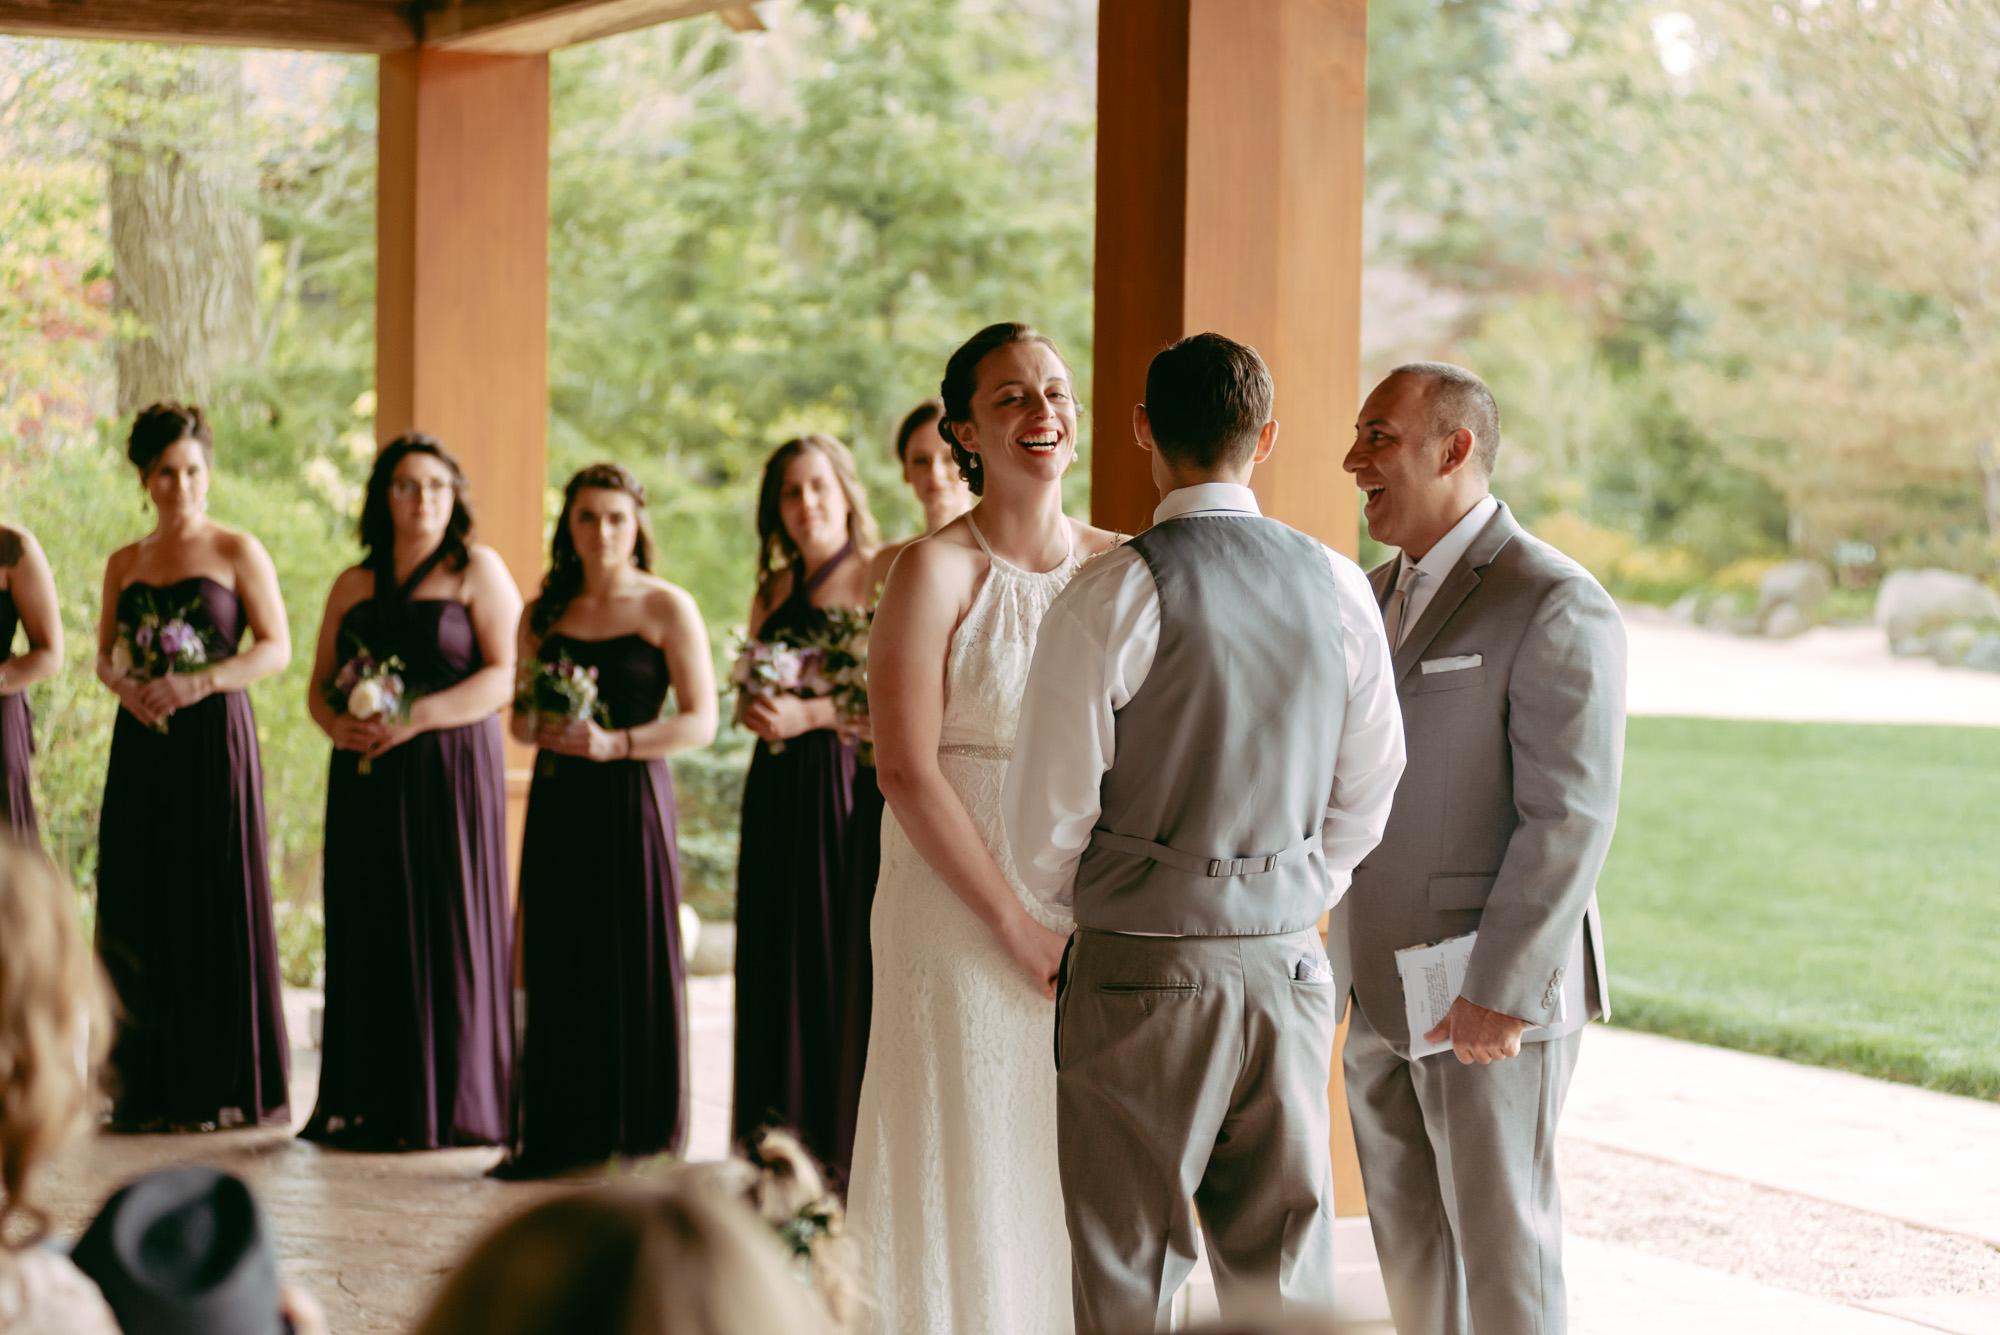 prairie-street-brewhouse-wedding-Rockford-IL-wedding-photographers-131.jpg